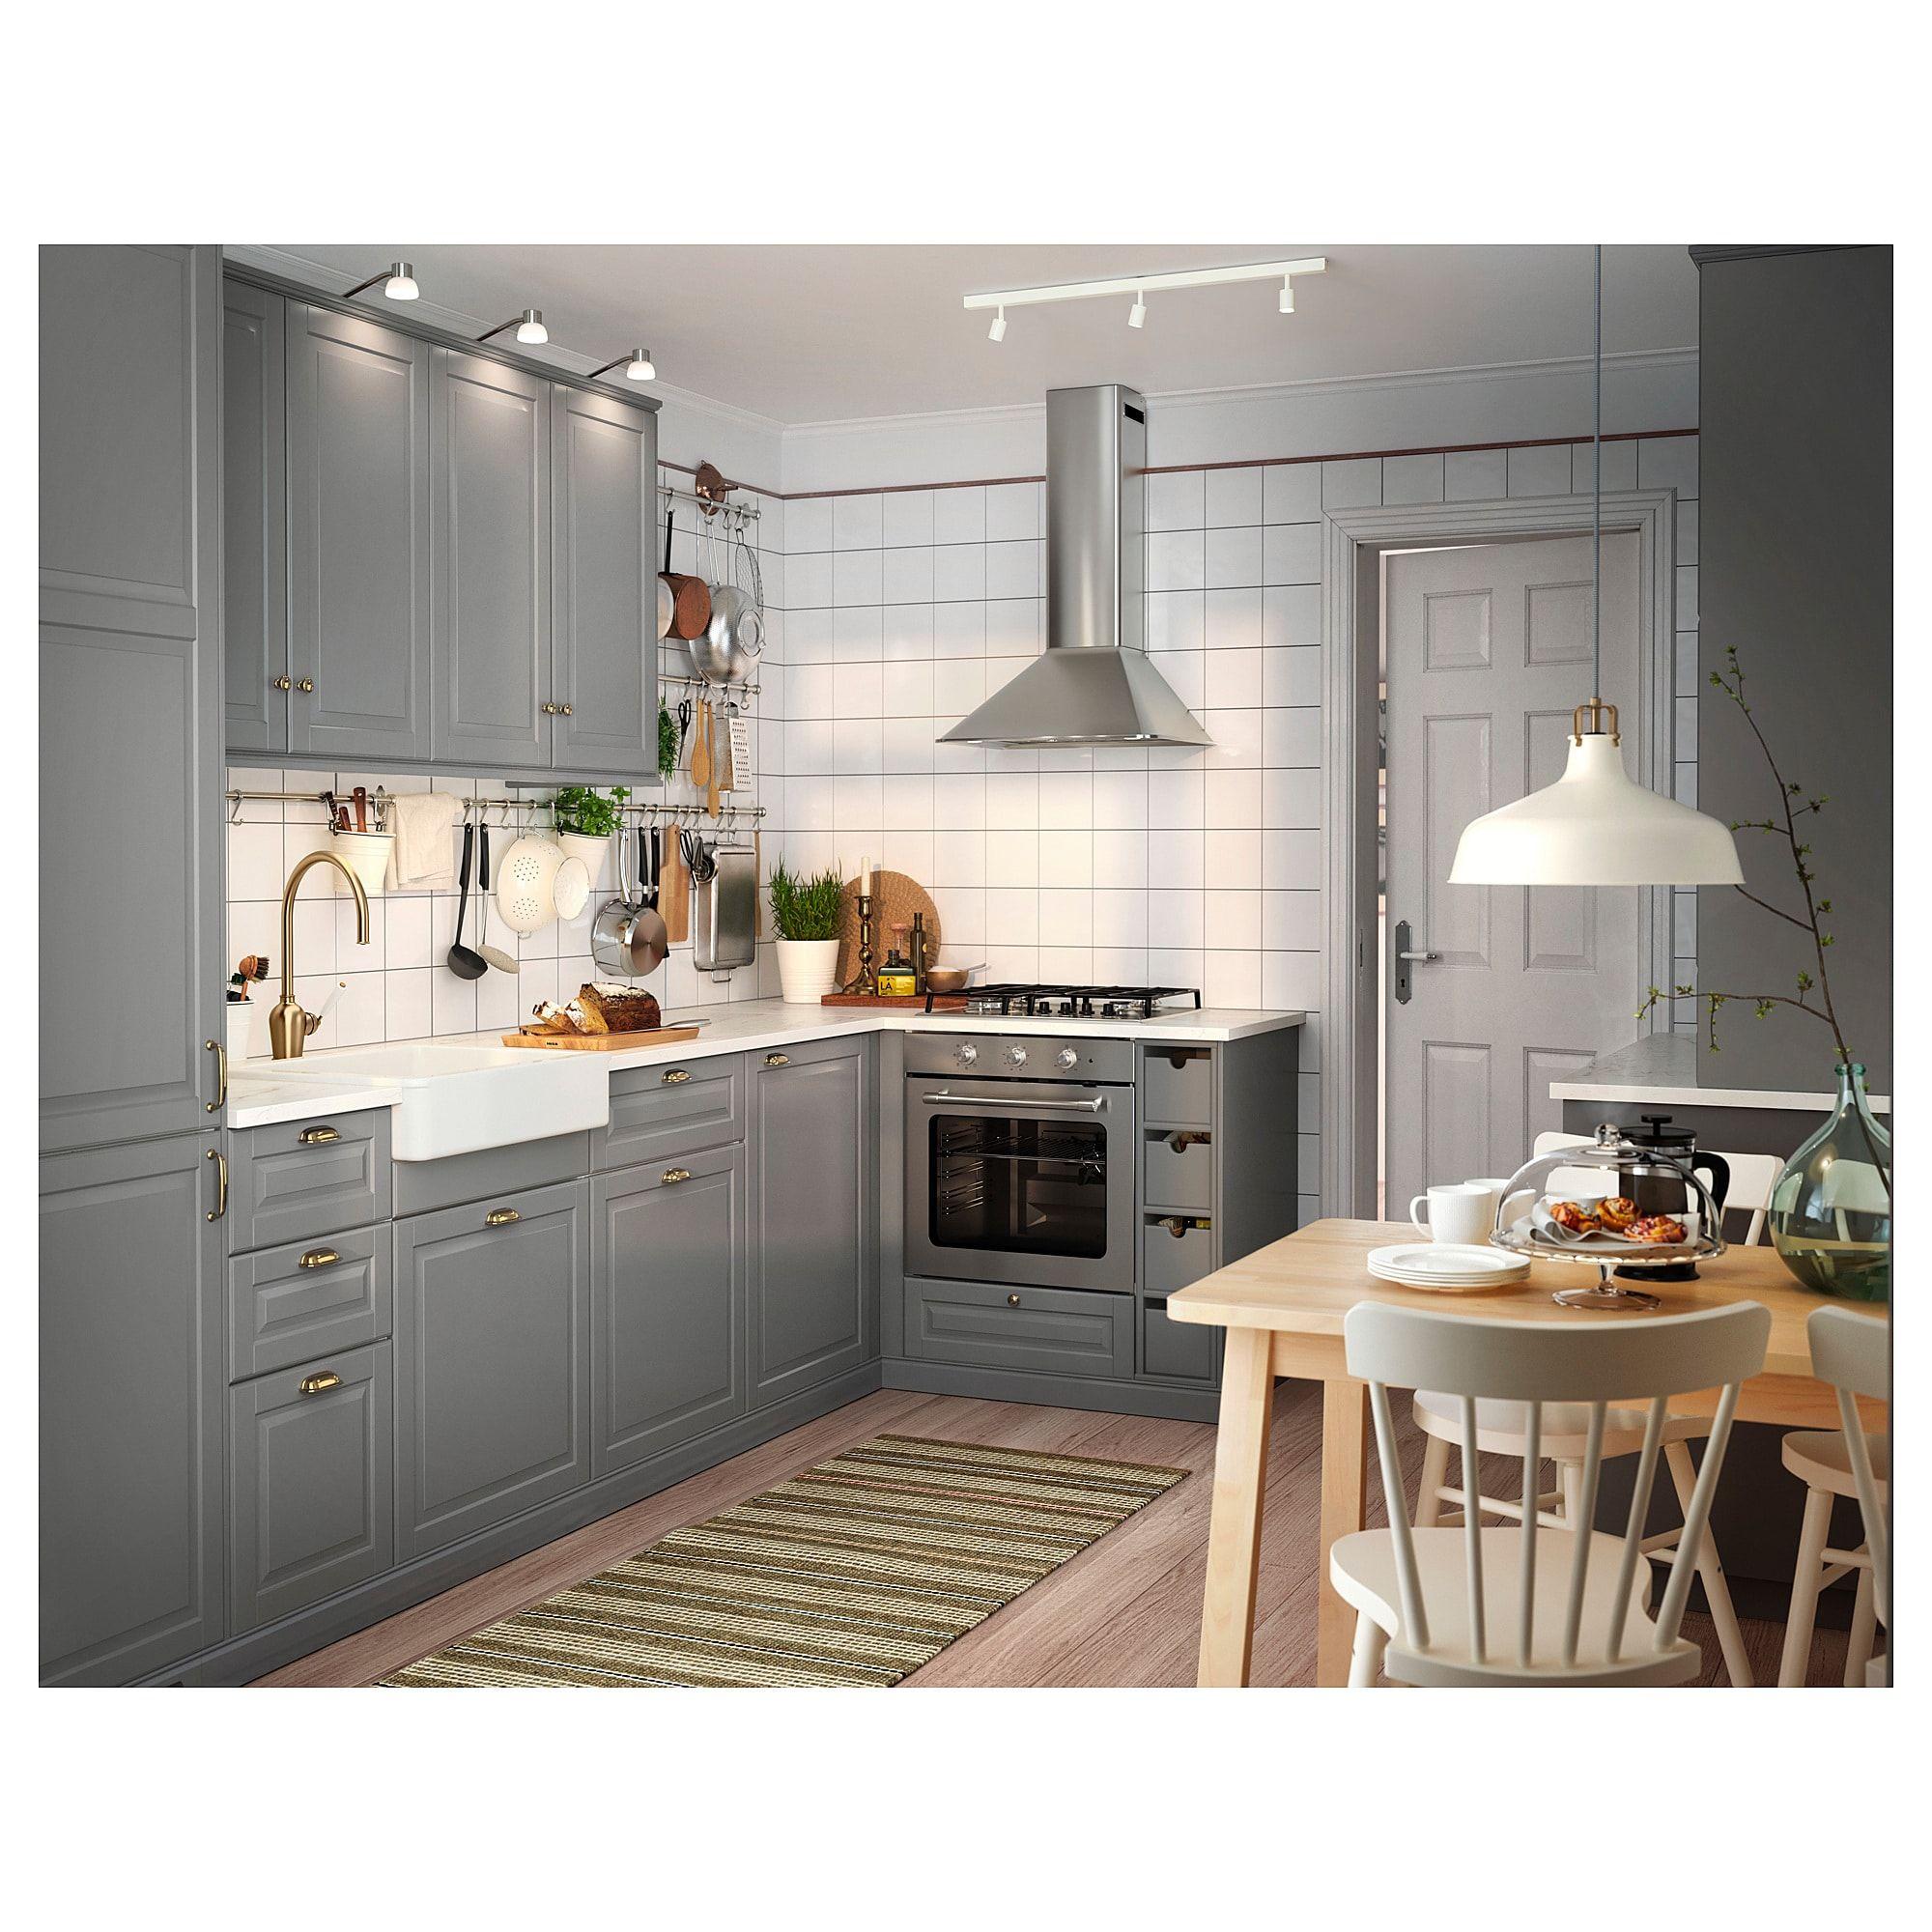 Havsen Evier Avec Face Avant Visible Blanc Ikea Small Cottage Kitchen Kitchen Design Small Kitchen Sale